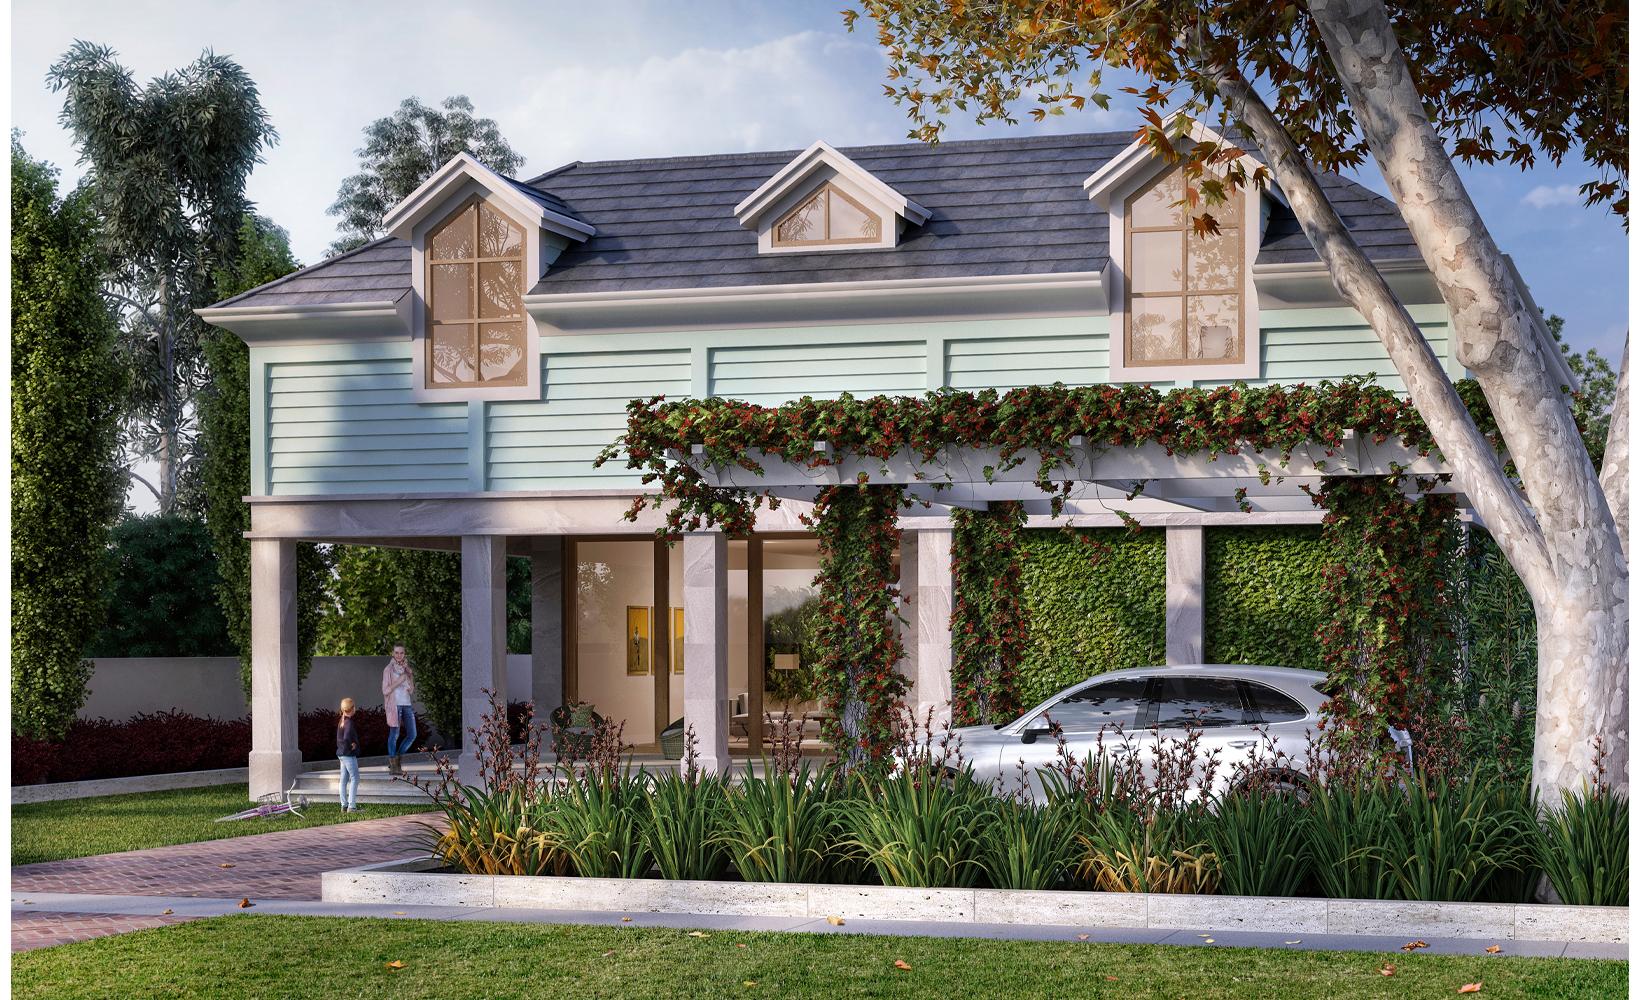 maek-custom-home-build-process-designs-in-development-11.jpg